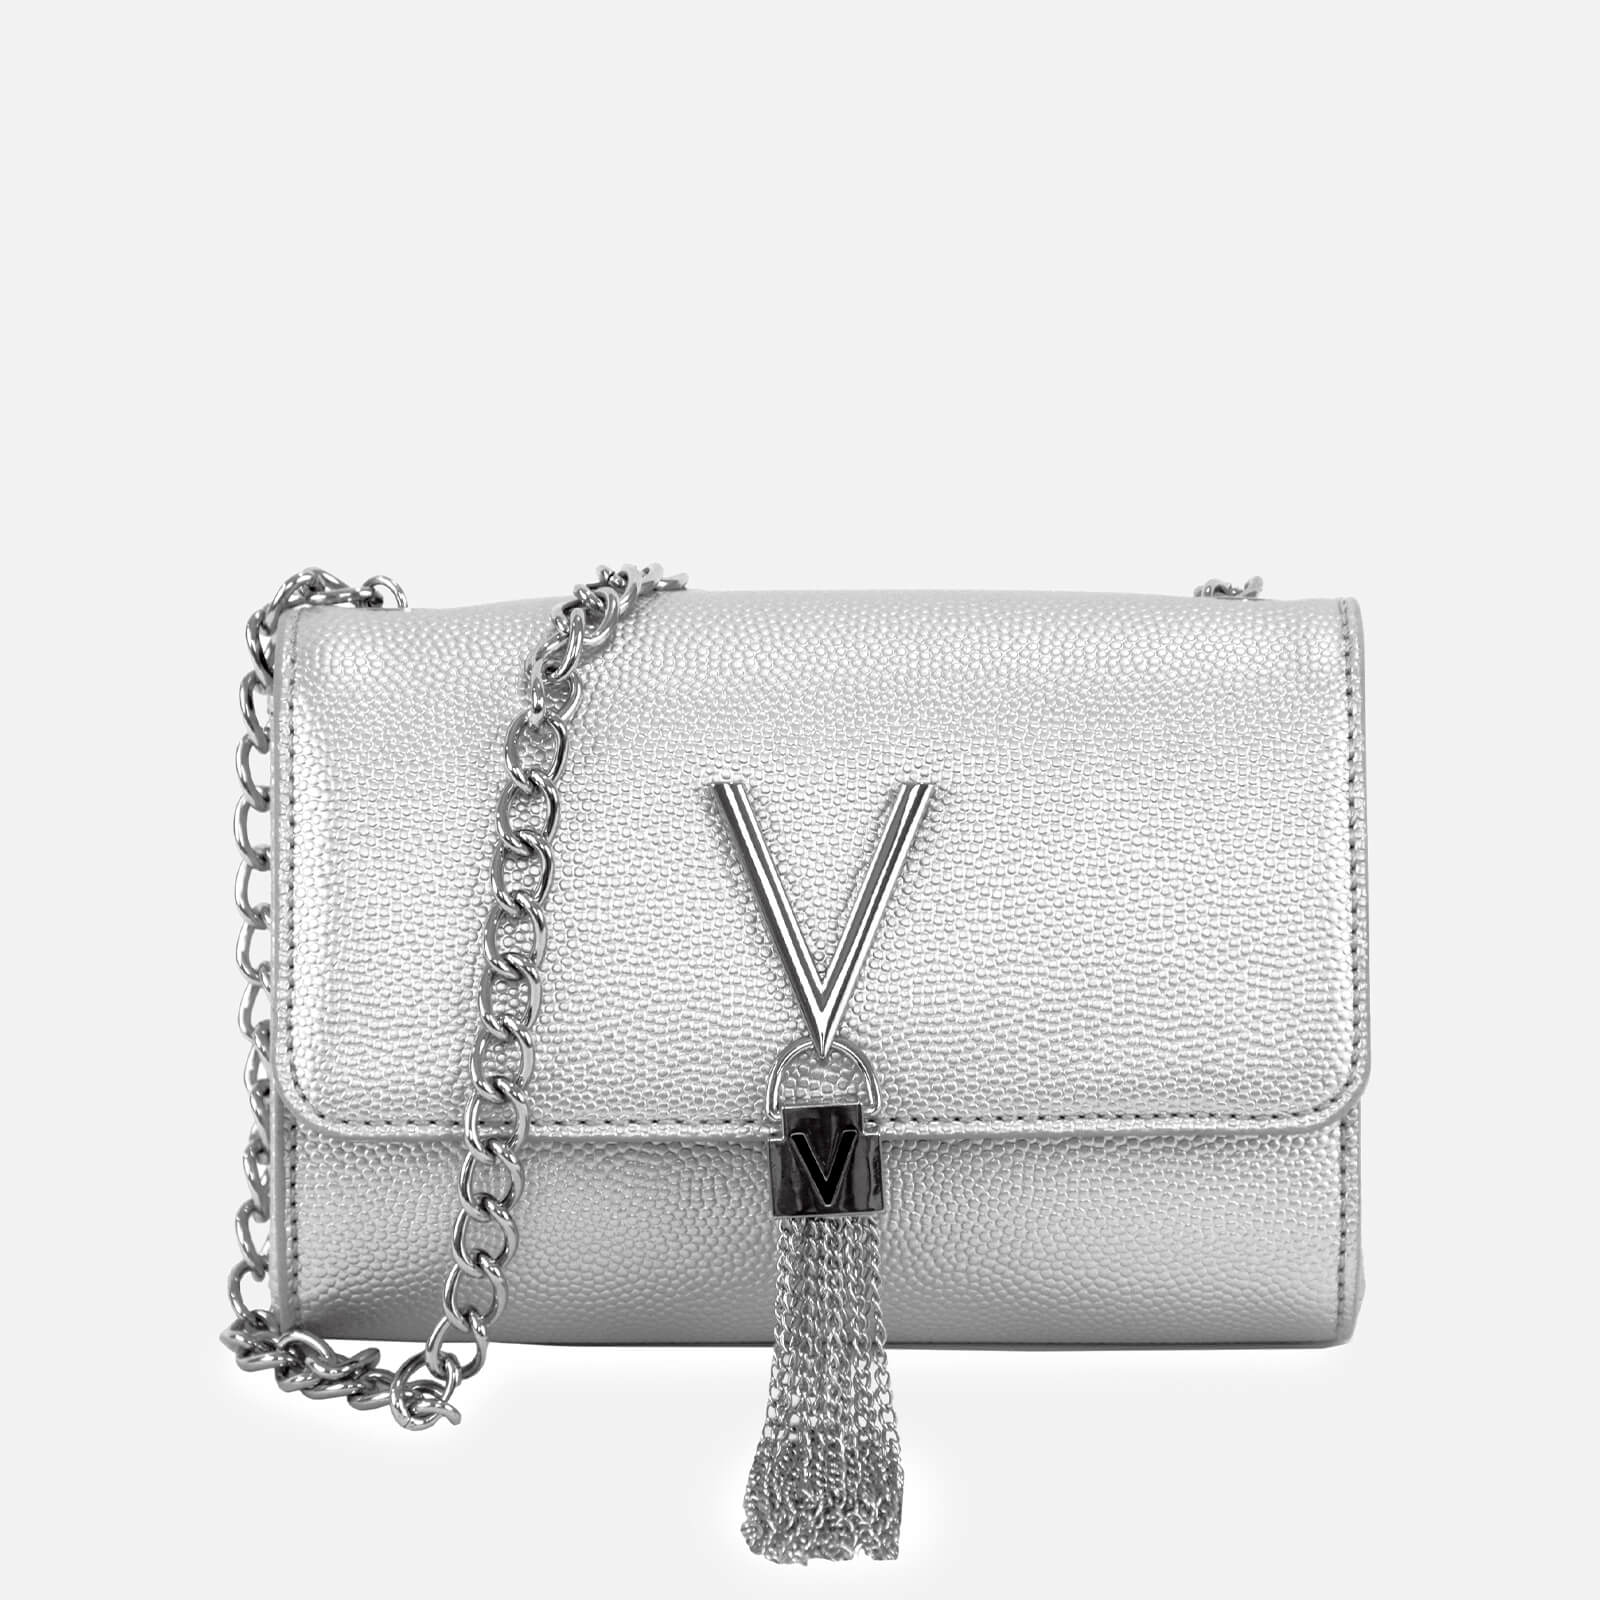 Valentino Bags Women's Divina Small Shoulder Bag - Silver